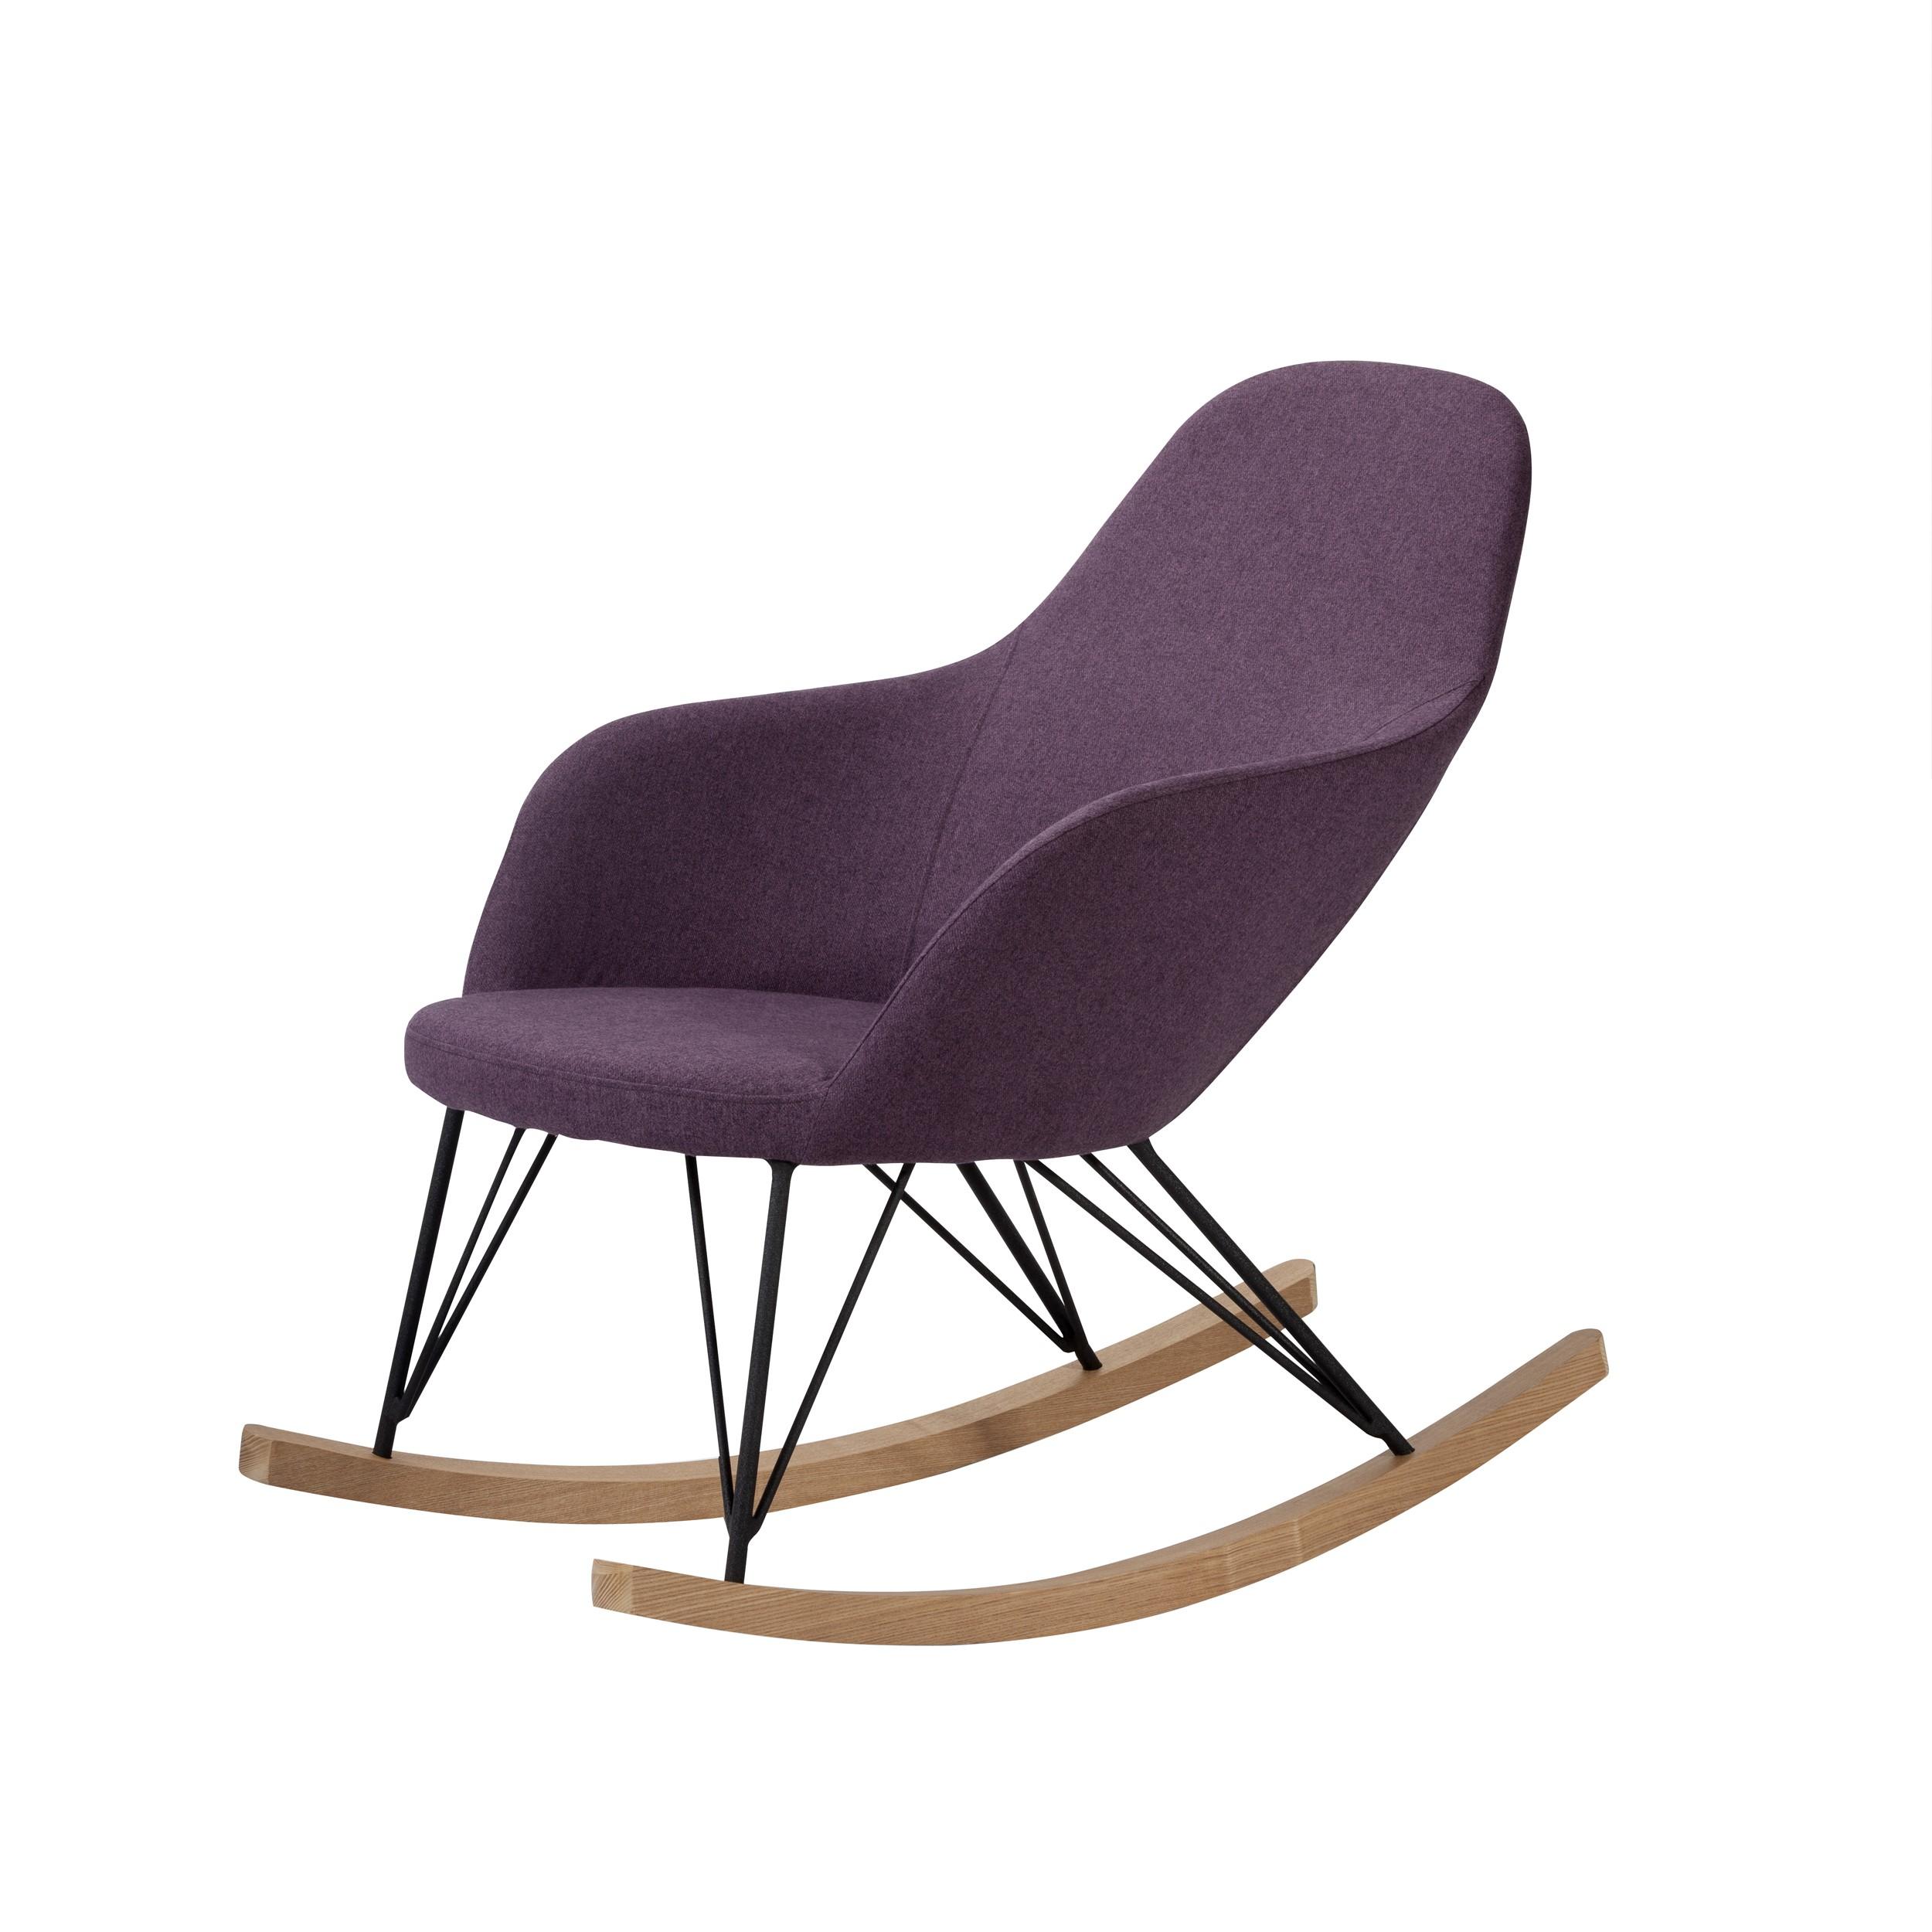 Rocking Chair Malibu Violet Achetez Nos Rocking Chair Malibu